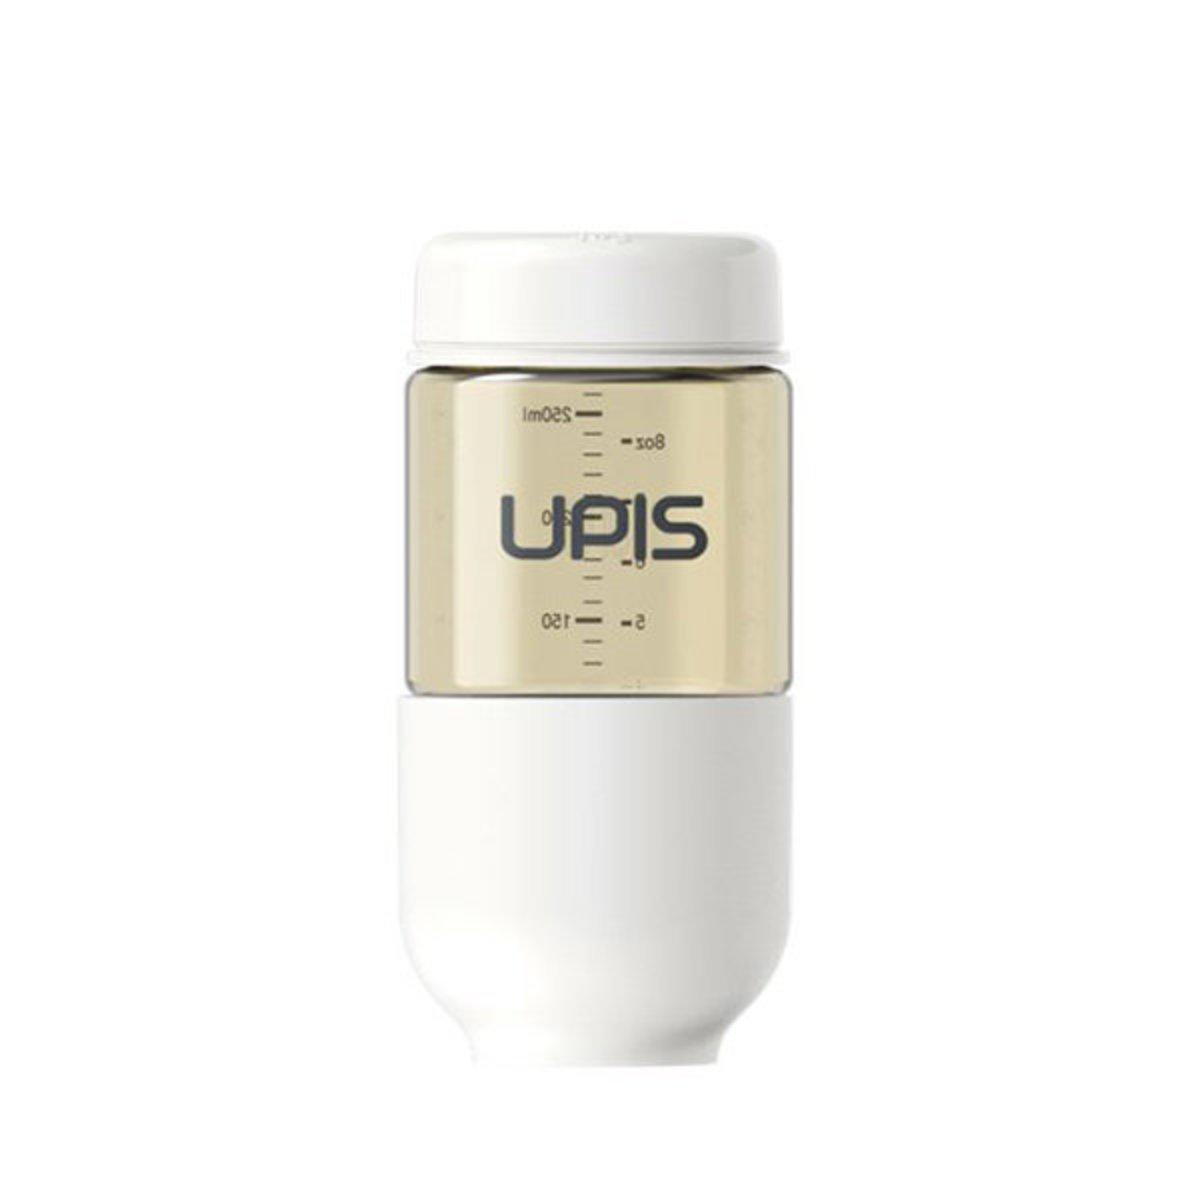 Upis PPSU Only Bottle (260ml, White)